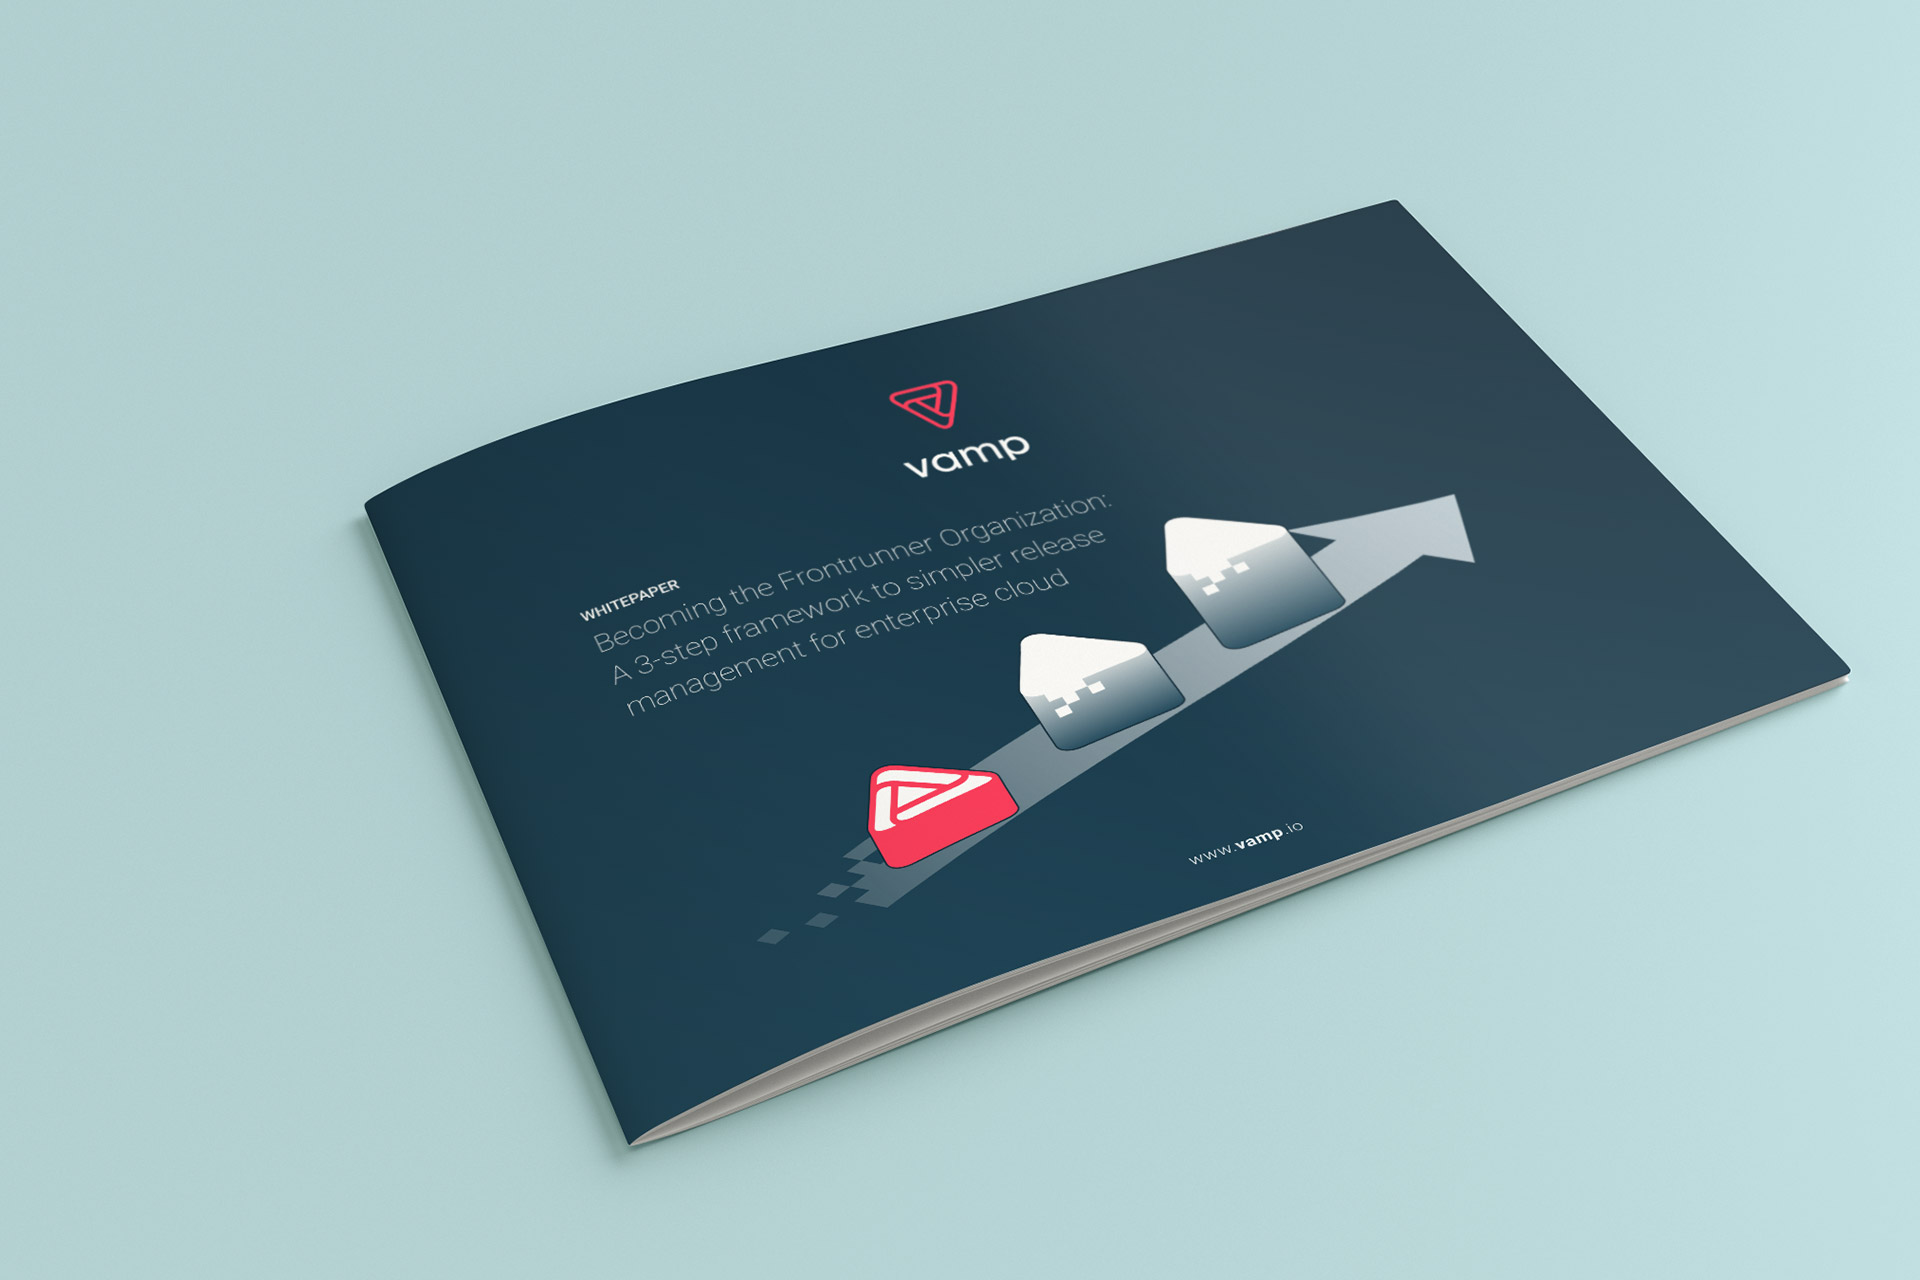 milen galabov vamp whitepaper design